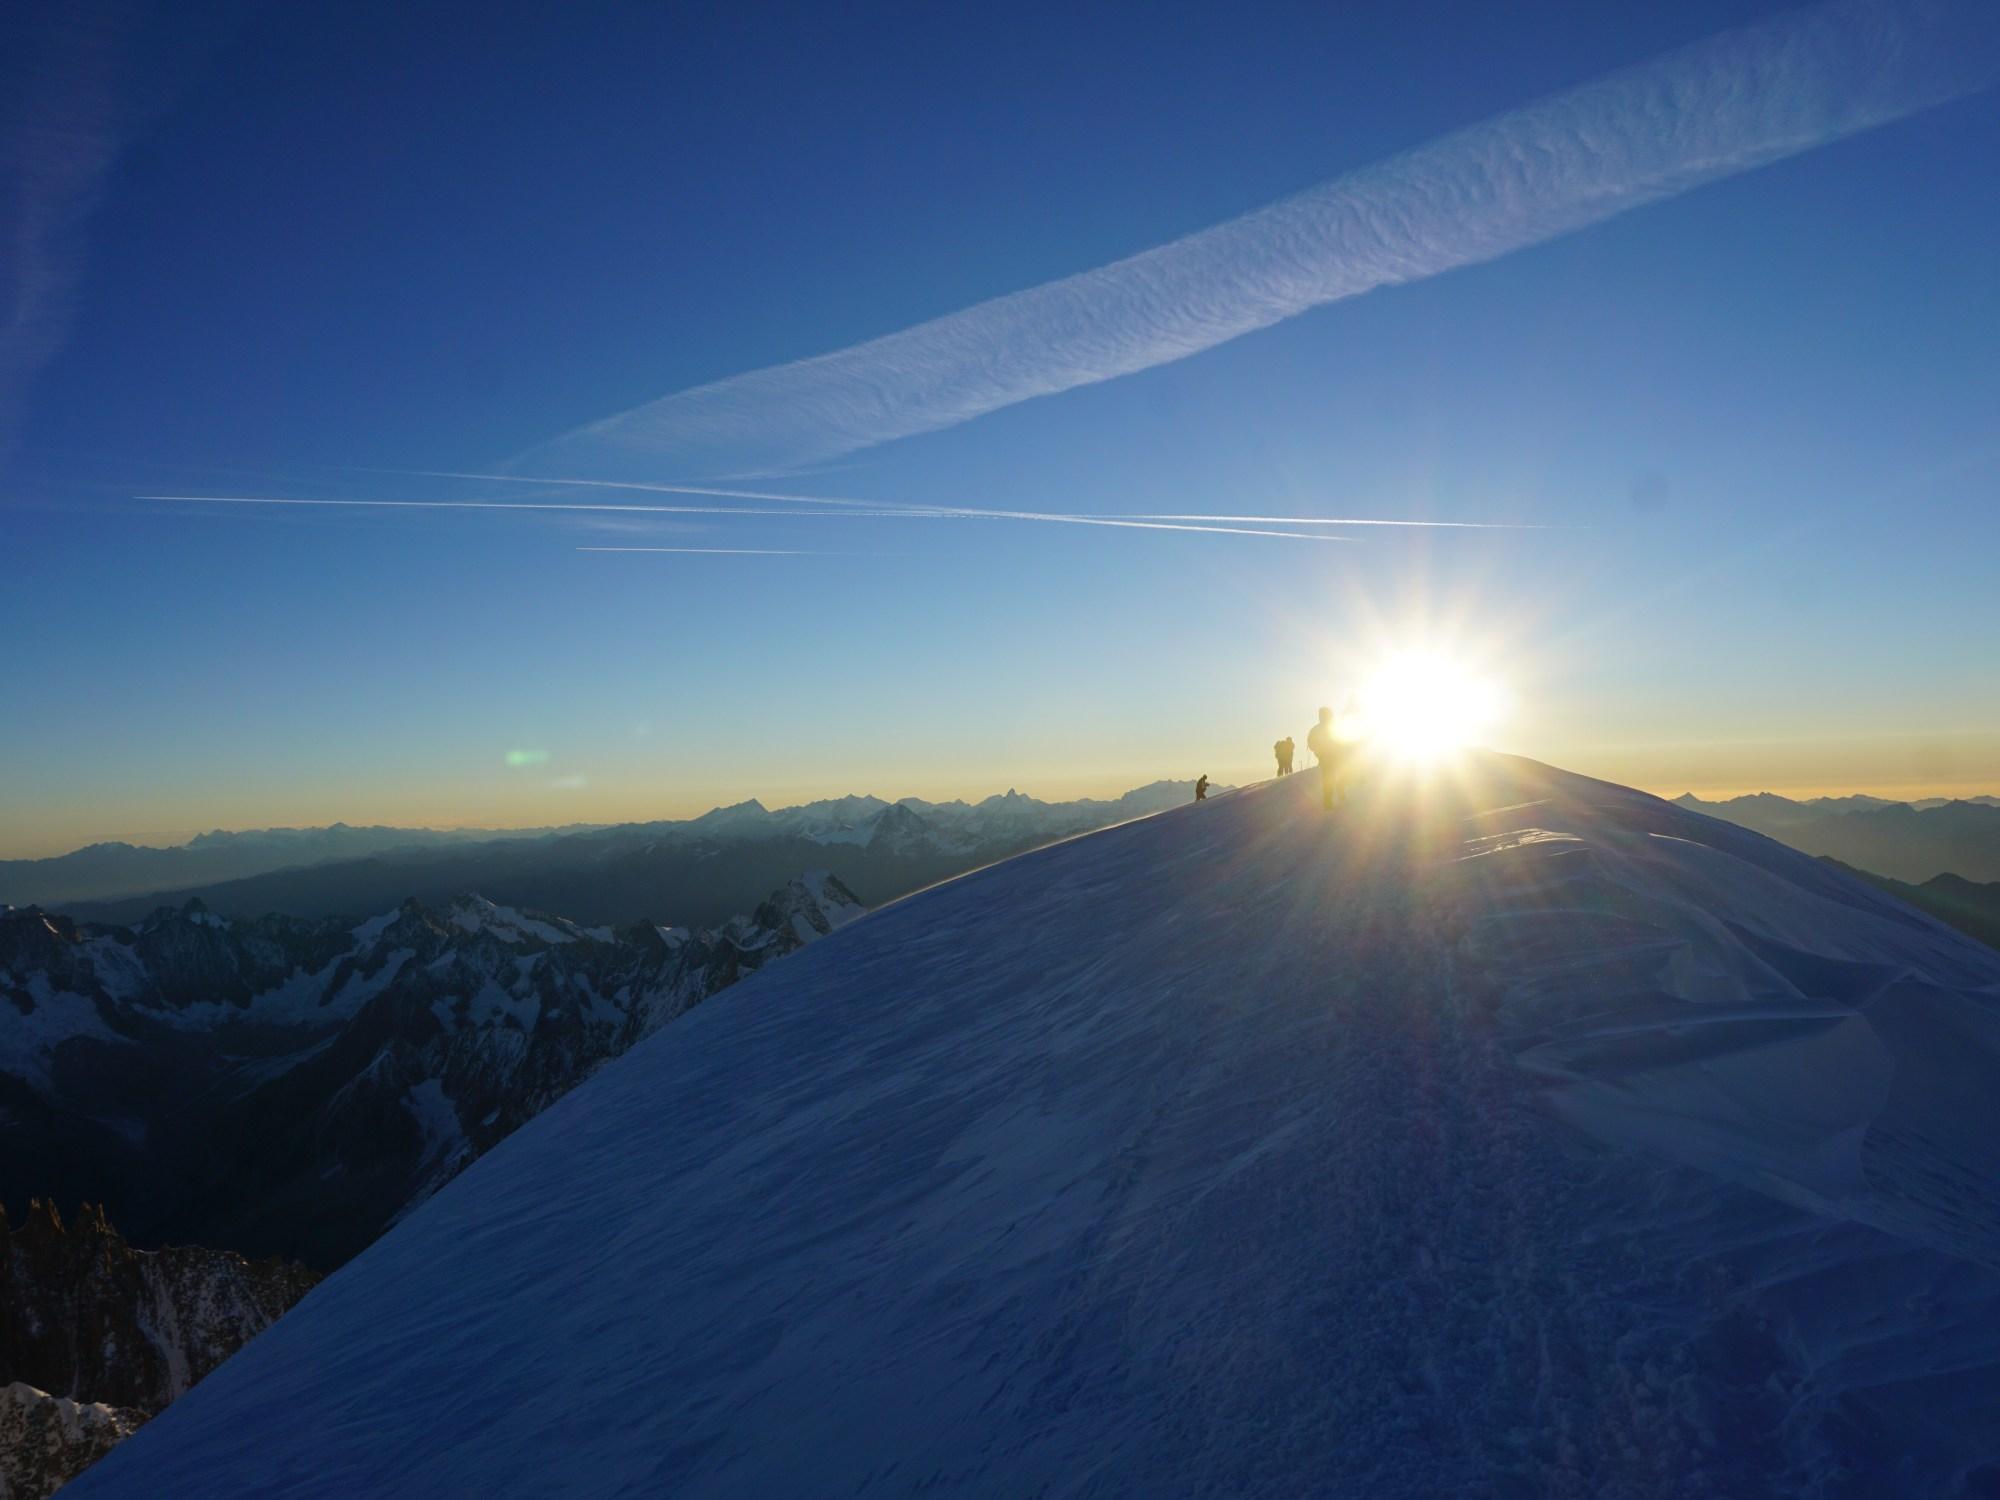 mt blanc, summit, sunrise, jo clark